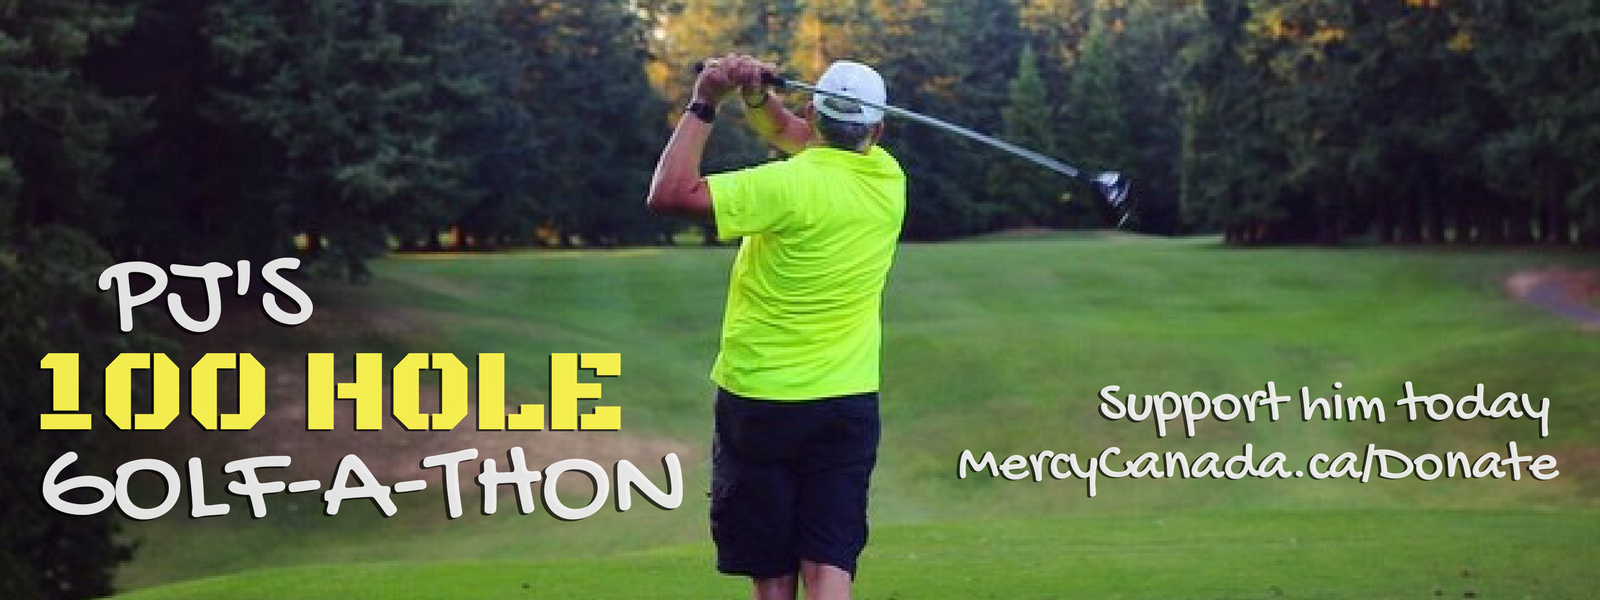 PJ's 100 Hole Golf-A-Thon